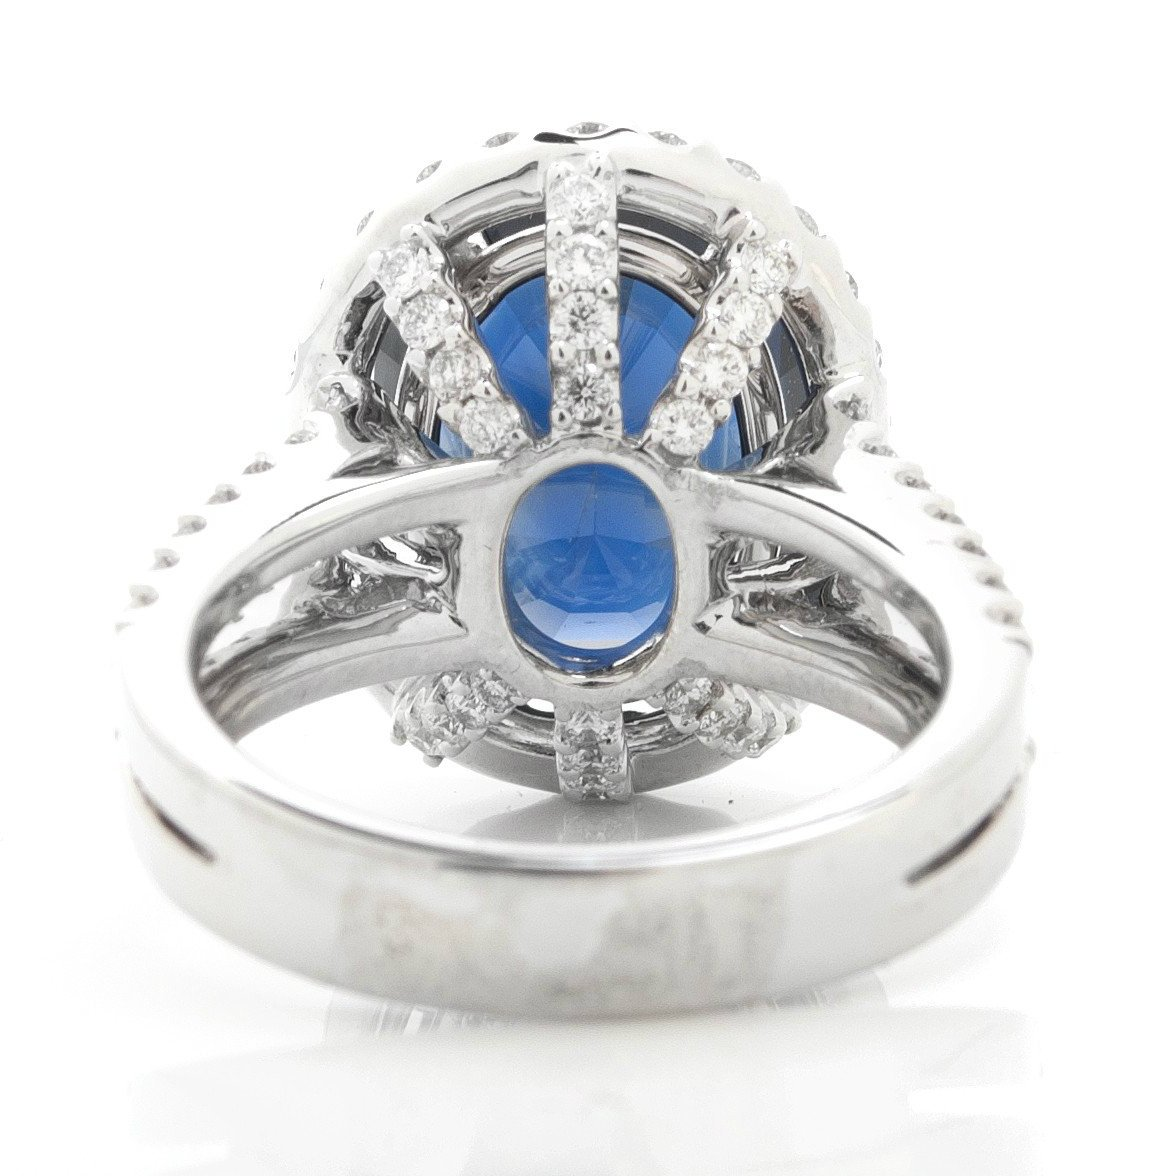 7.60 Carat Oval Blue Sapphire & Diamond Cocktail Ring